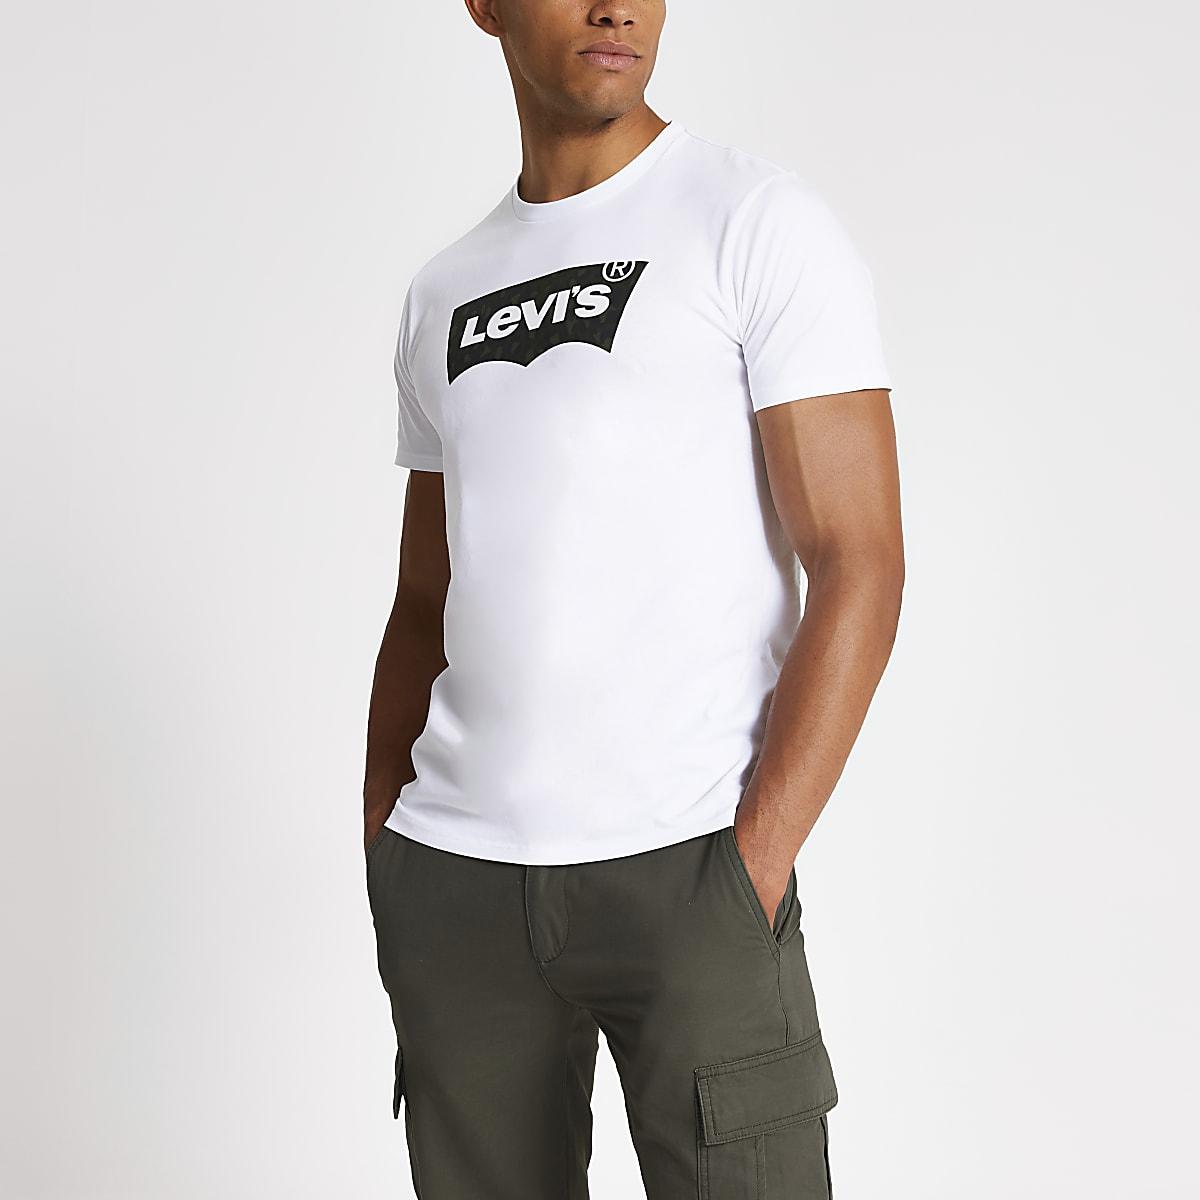 Levi's white logo short sleeve T-shirt